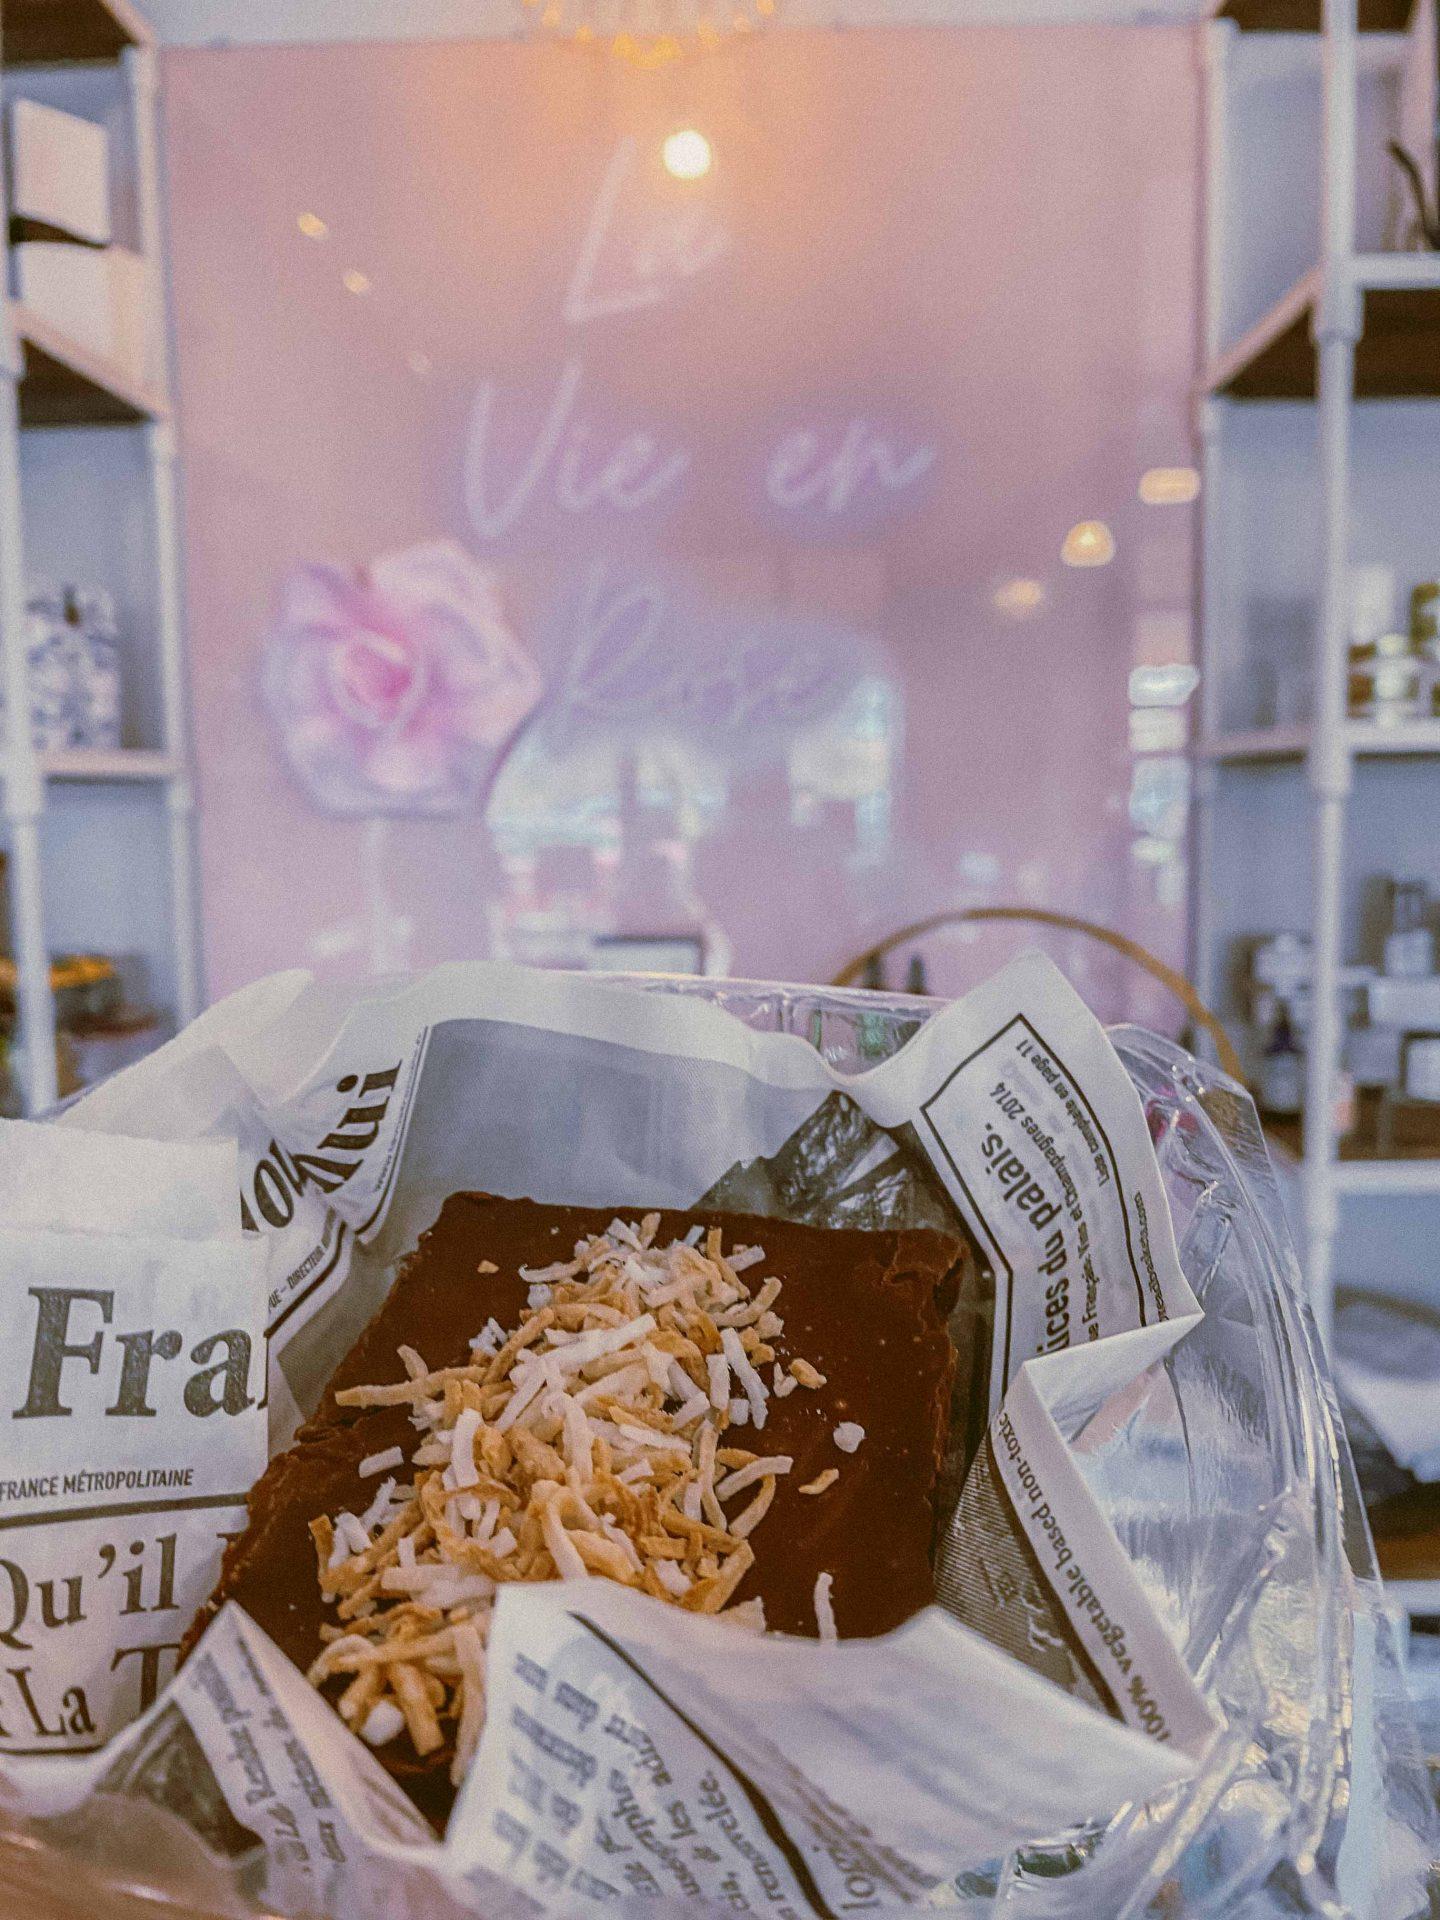 Sweet Dees Bake Shop, Best Bakery Scottsdale Arizona, Coffee Shop Scottsdale Arizona, Travel guide to scottsdale Arizona, ultimate guide, where to eat scottsdale, travel blogger Arizona, gluten free bakery scottsdale, vegan bakery scottsdale, where to go scottsdale